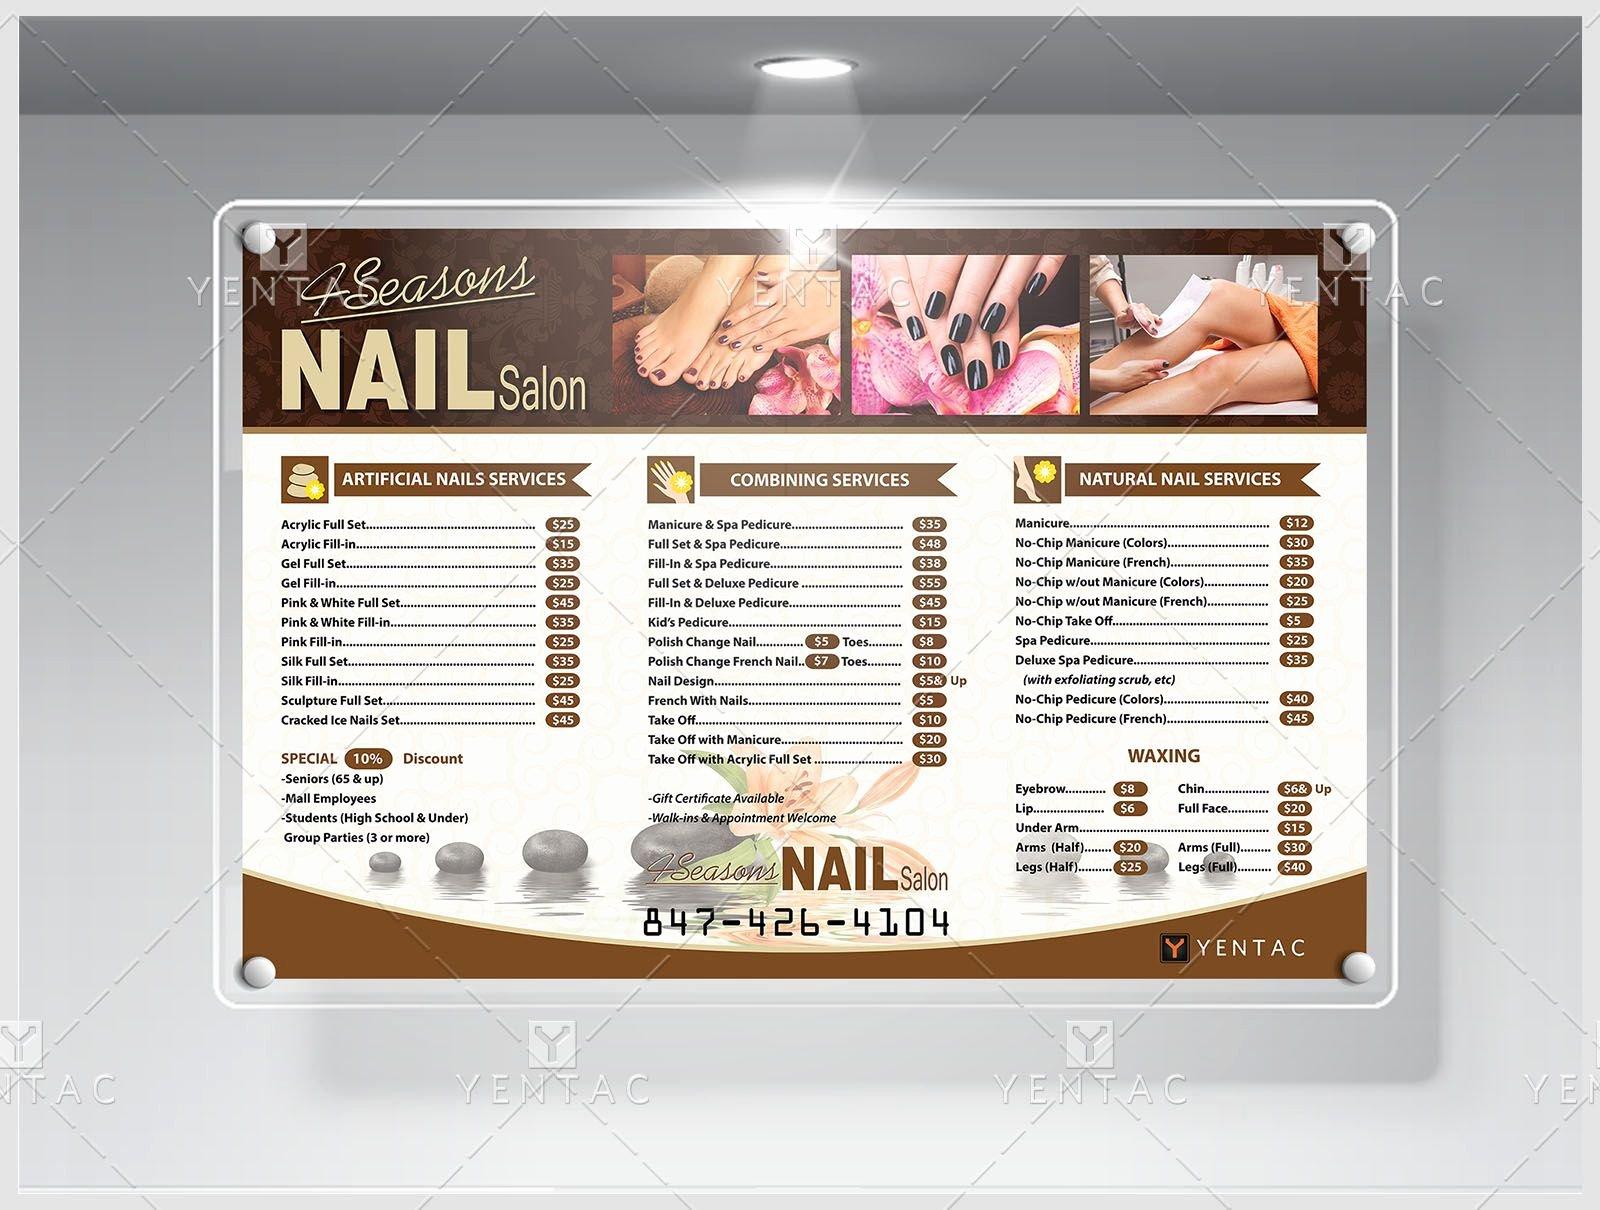 Product 5100 4 Seasons Nail Salon Price List Yentac